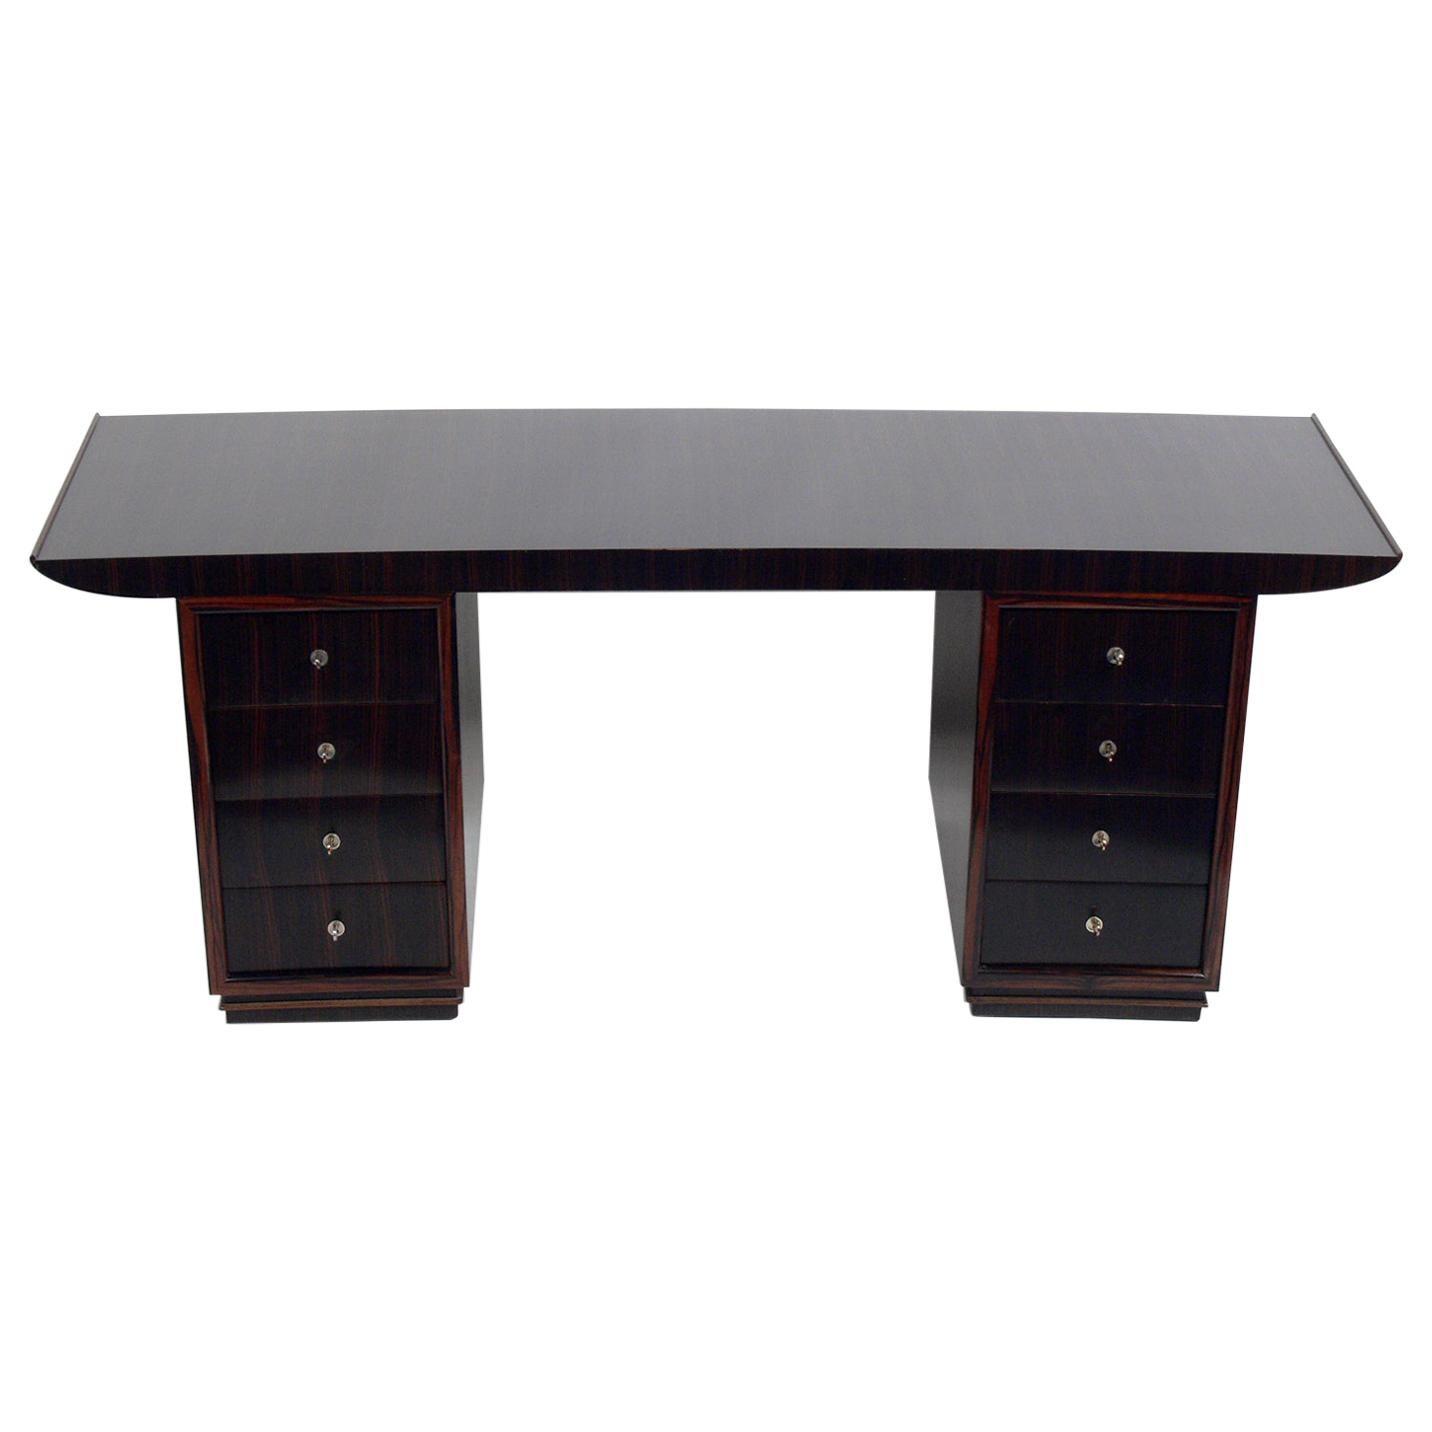 French Art Deco Macassar Desk by Dominique